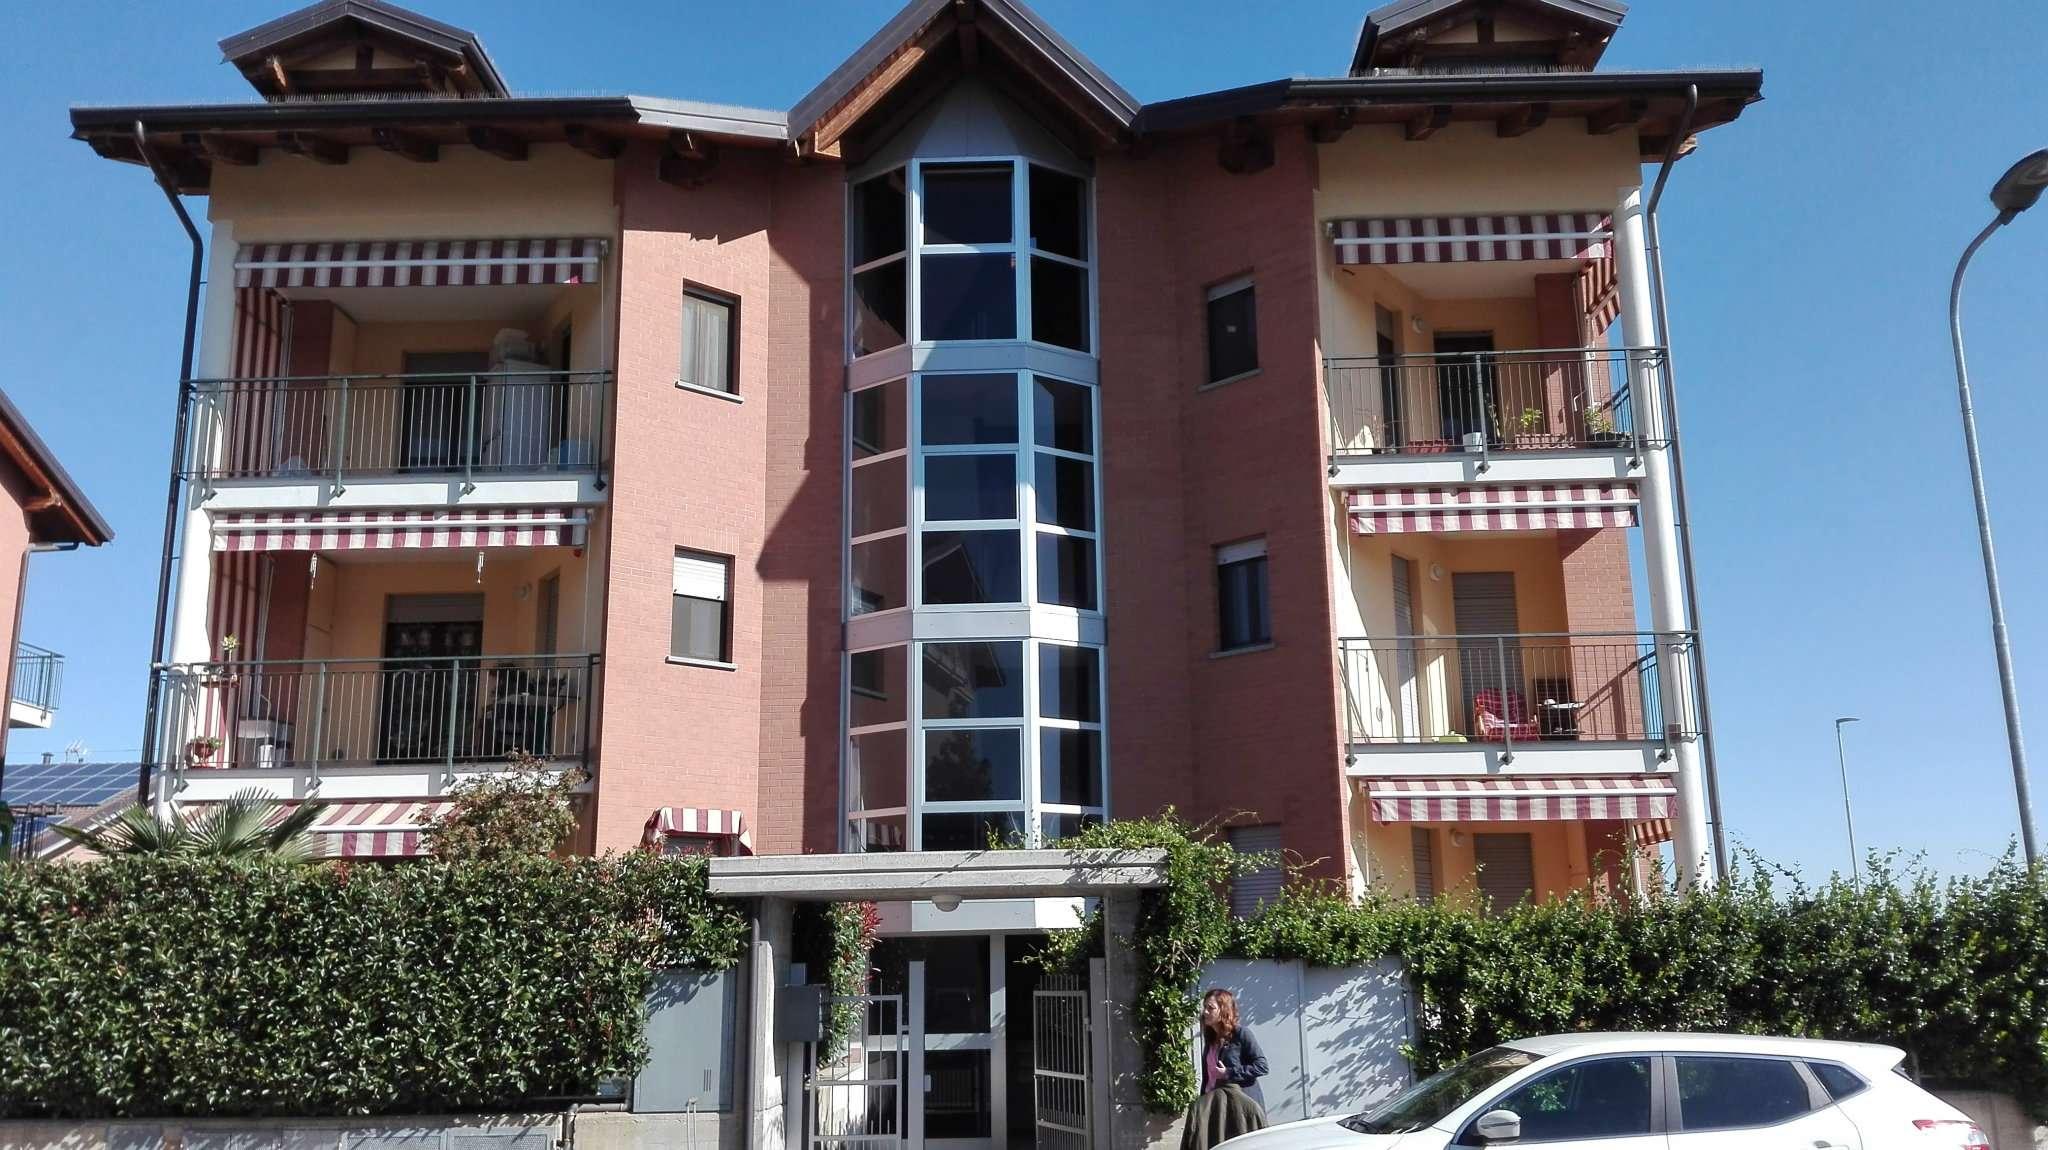 Attico / Mansarda in Vendita a Vinovo